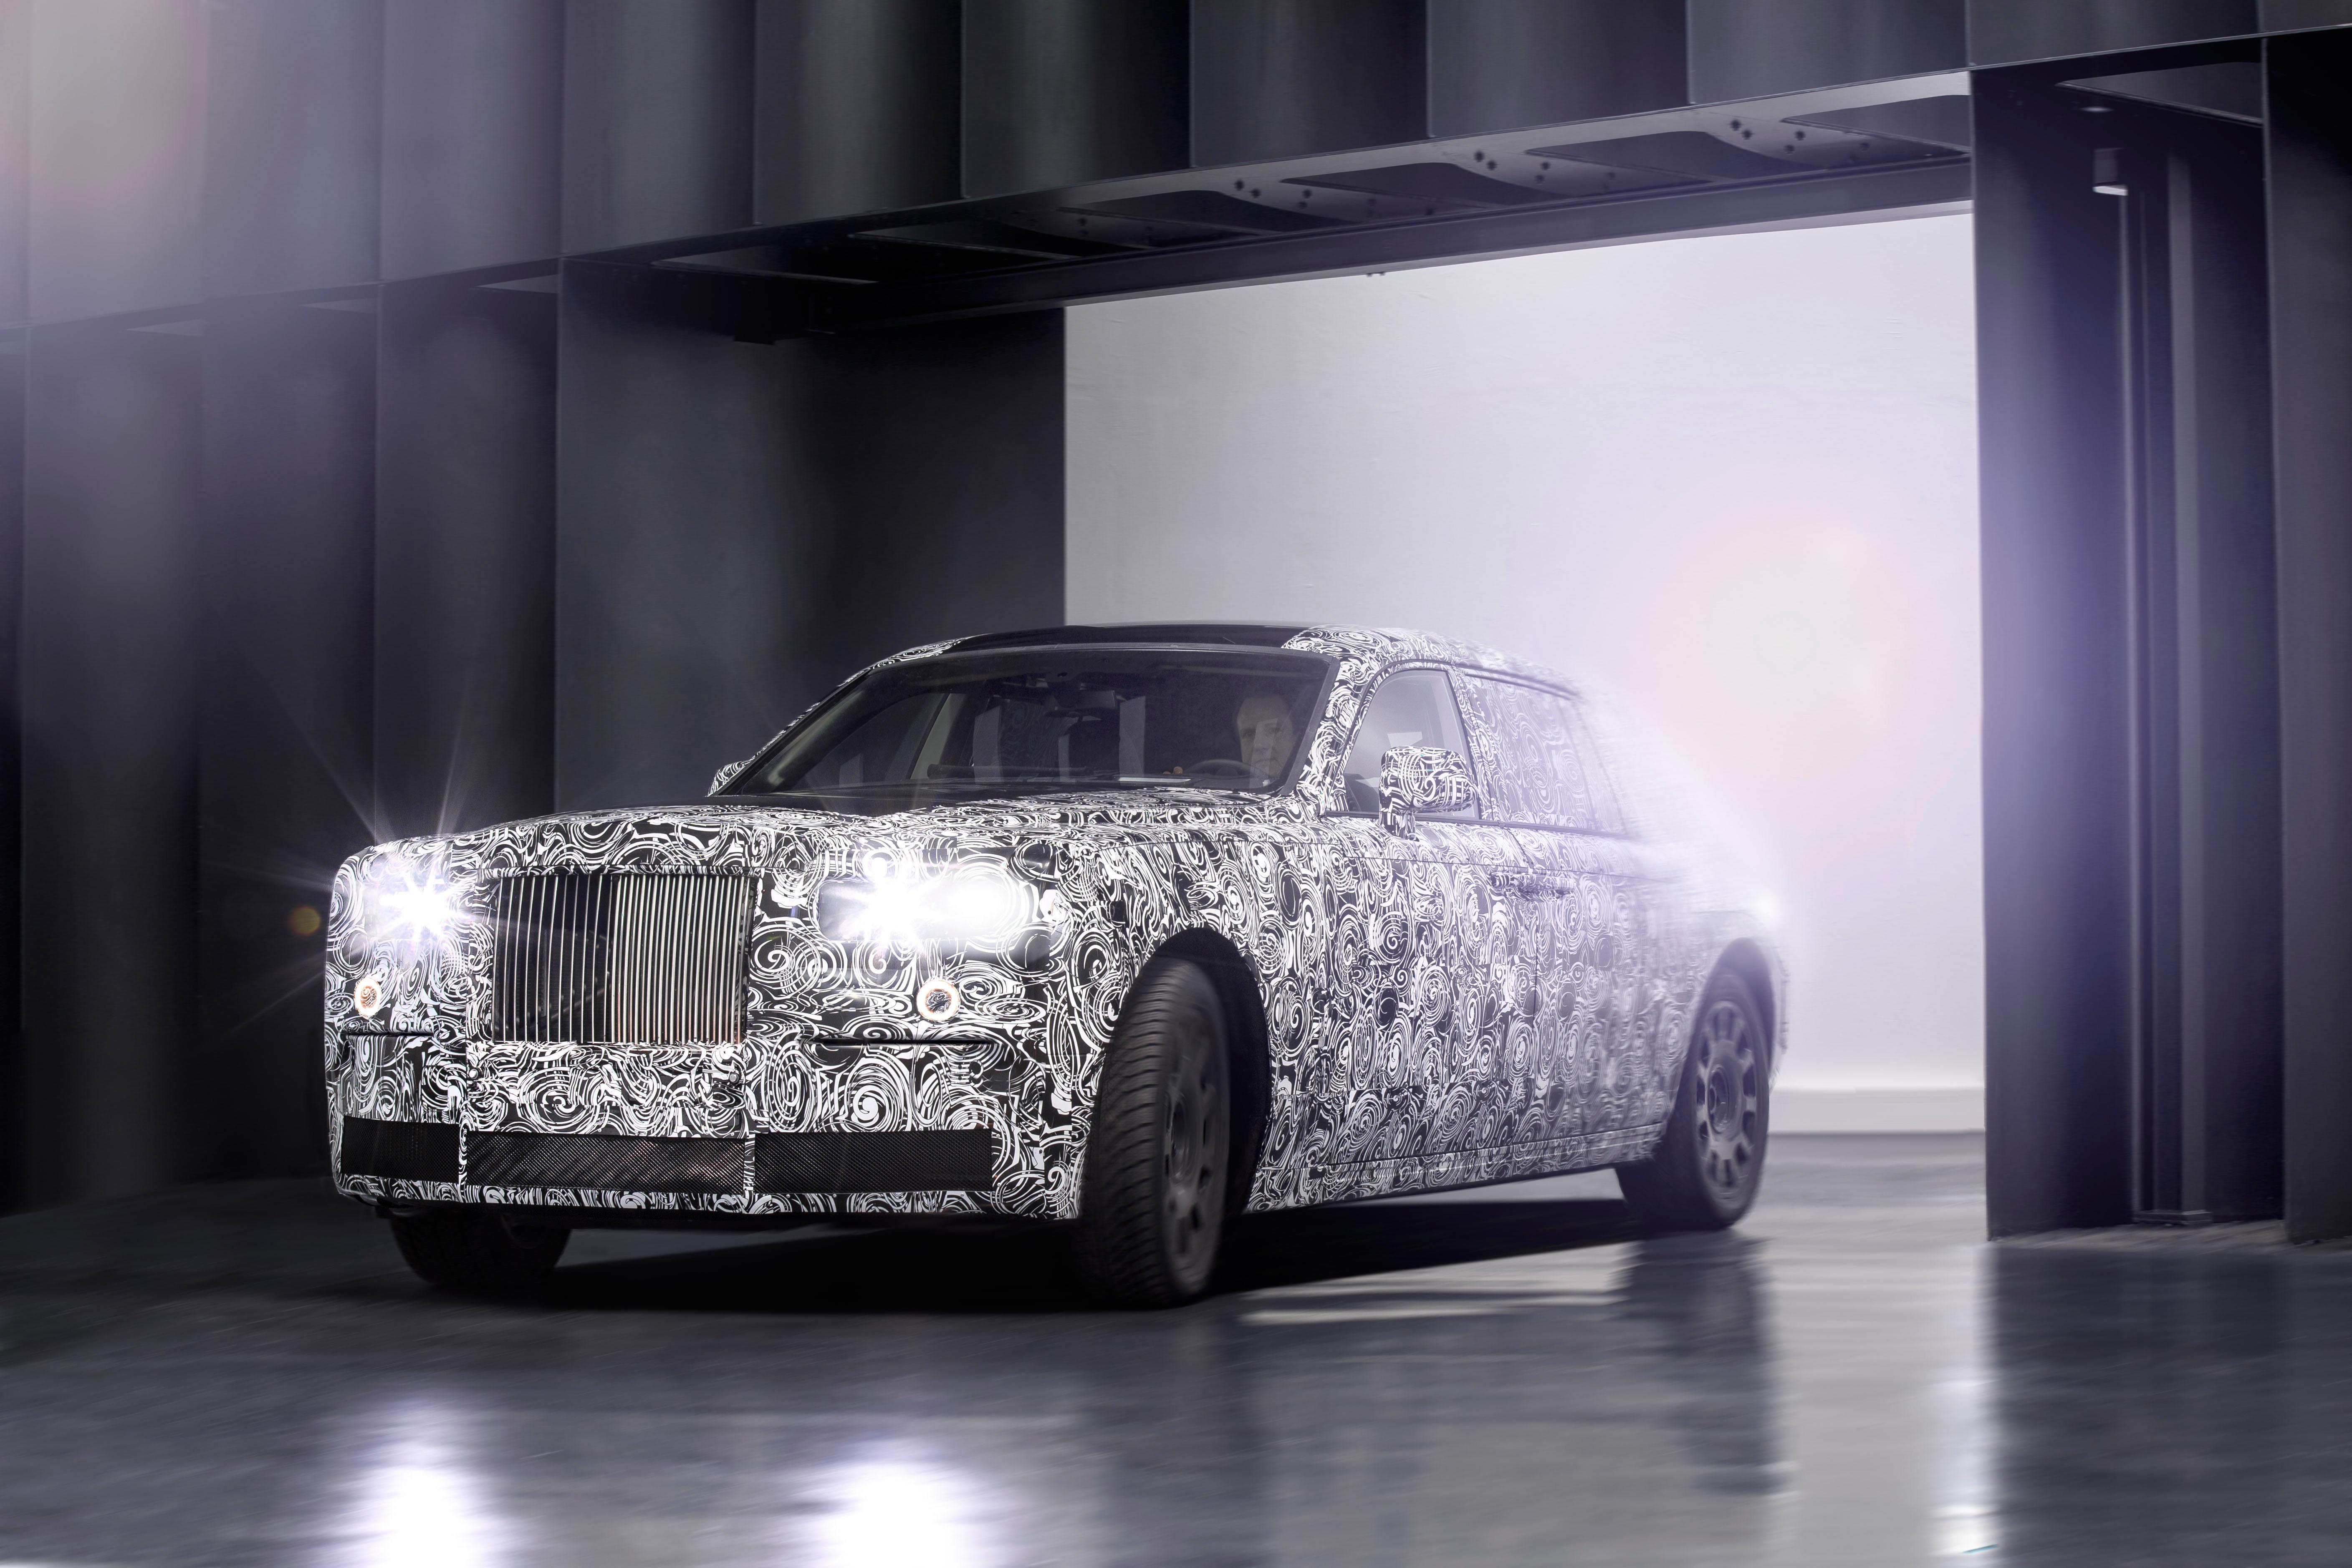 Rolls Royce SUV camouflage